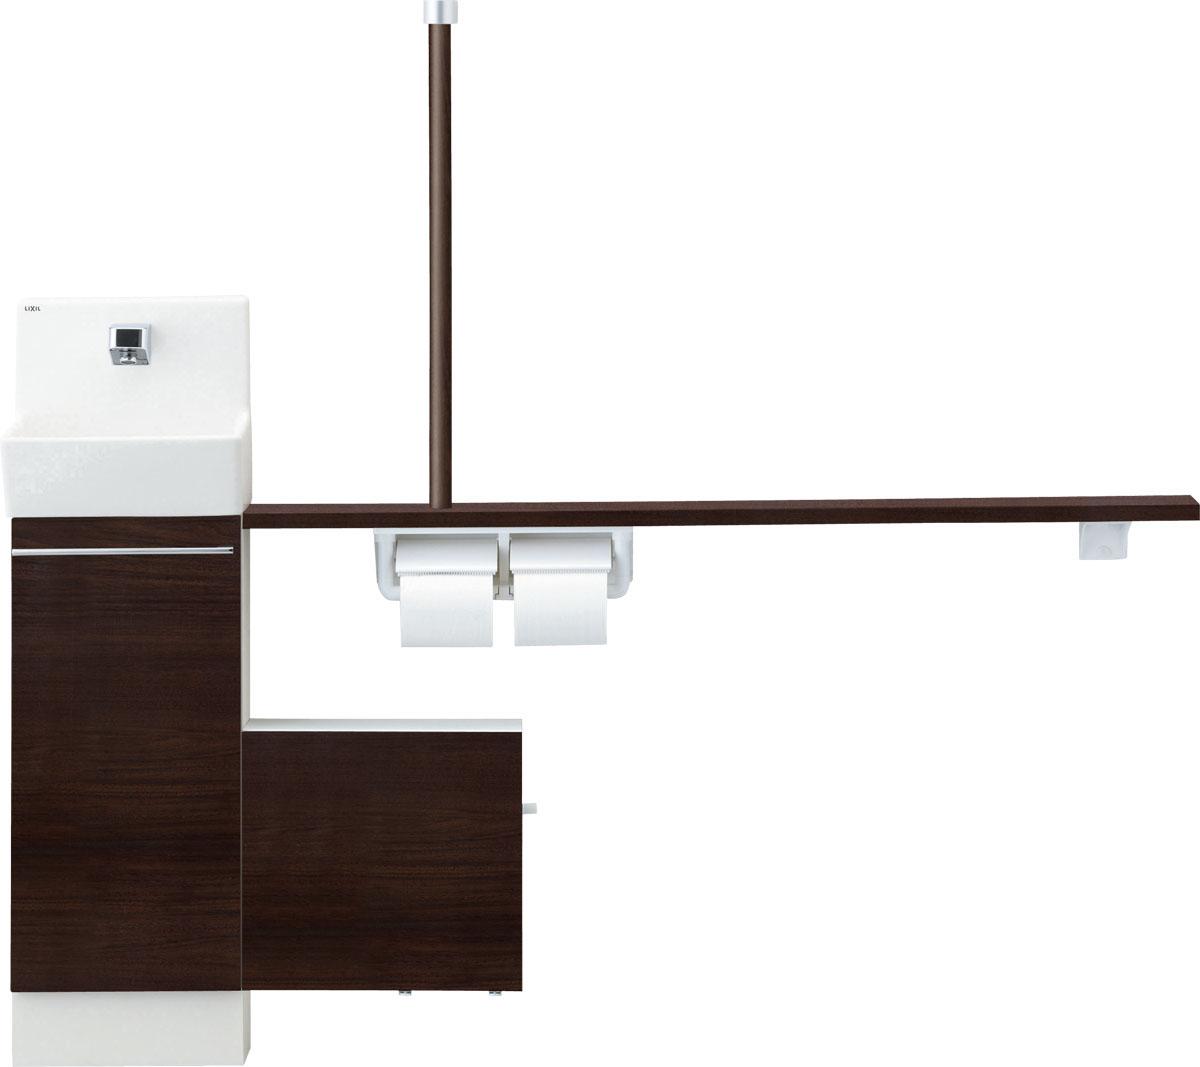 LIXIL INAX トイレ手洗 コフレル スリムタイプ 壁付 カウンター間口1500サイズ YL-DA82SSWL15B YL-DA82SSWR15B 人気,限定セール